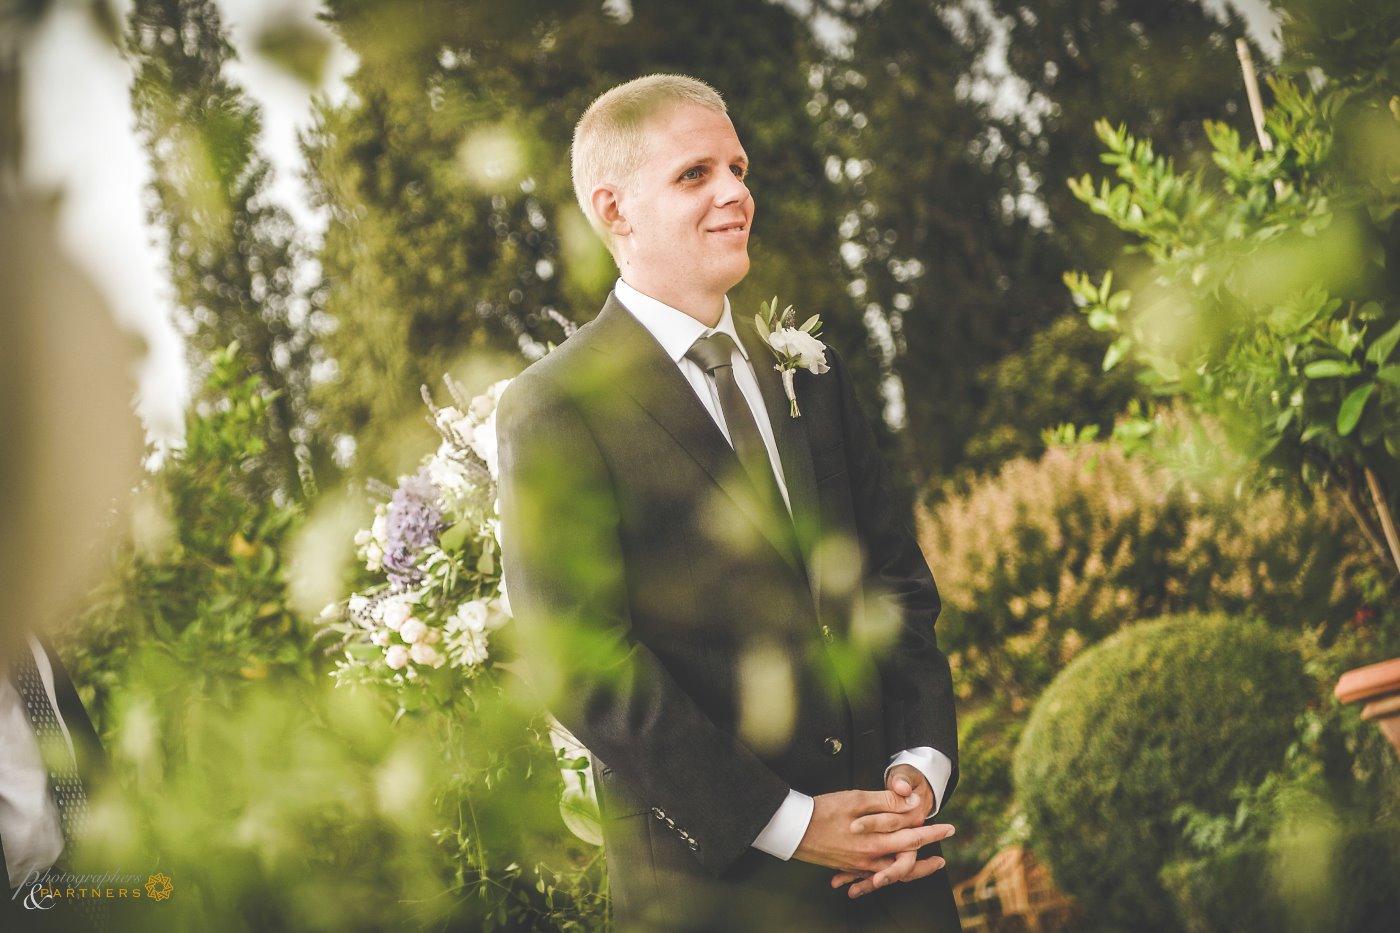 photographer_wedding_florence_05.jpg